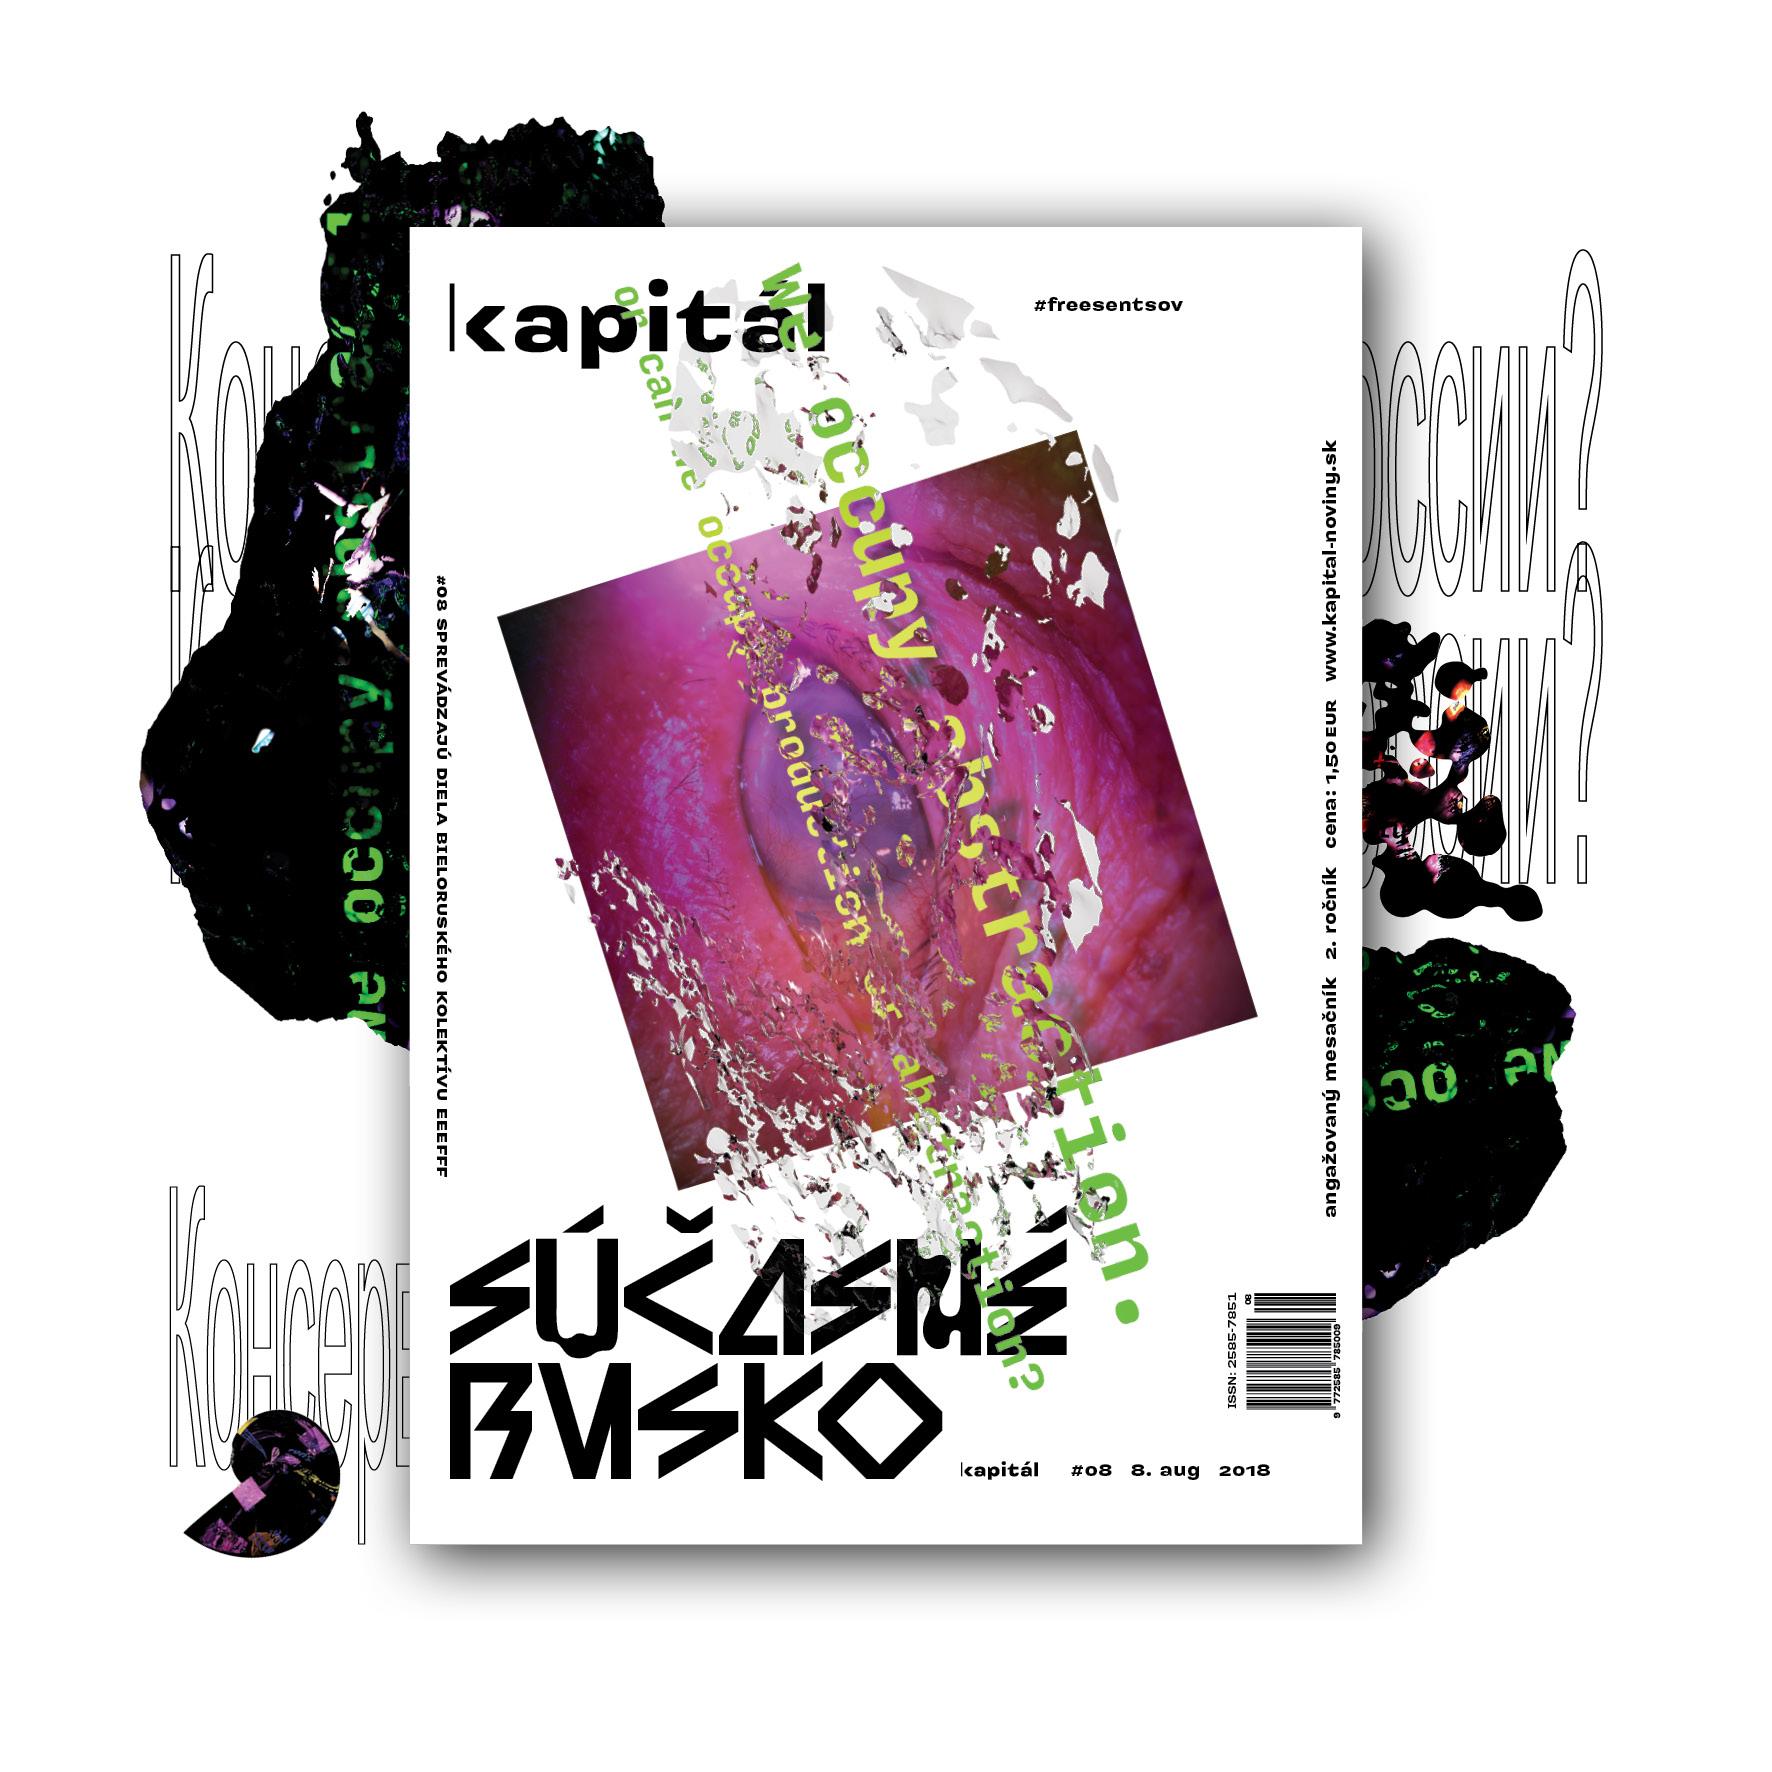 https://i0.wp.com/kapital-noviny.sk/wp-content/uploads/2018/09/1806_INSTA_KAPITAL-062.jpg?fit=1772%2C1772&ssl=1